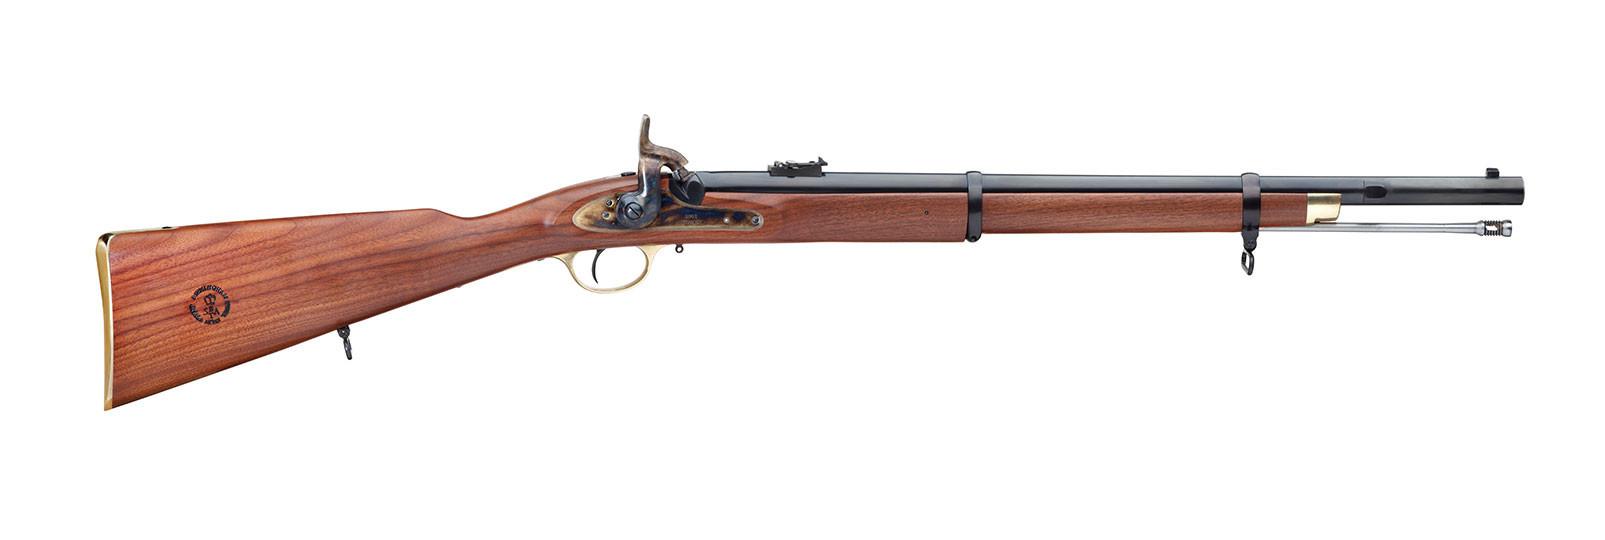 Enfield Musketoon P1861 Rifle